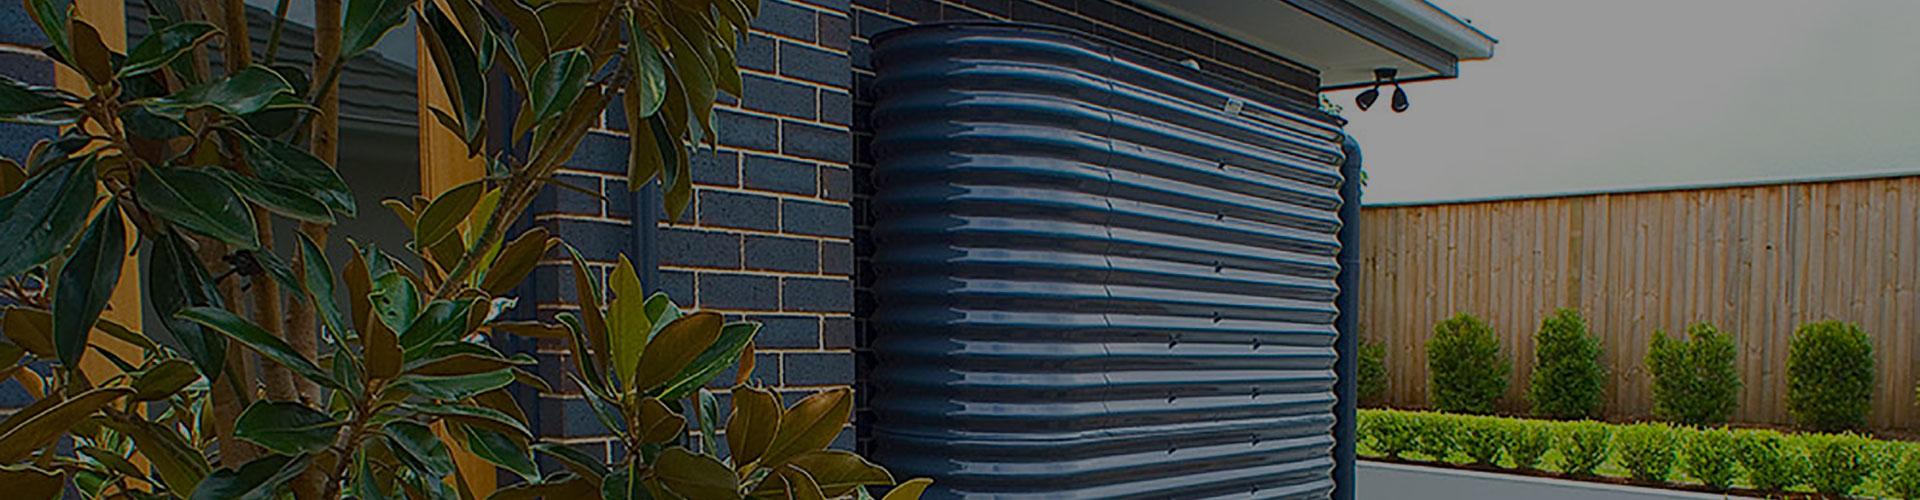 Rainwater-tanks-banner